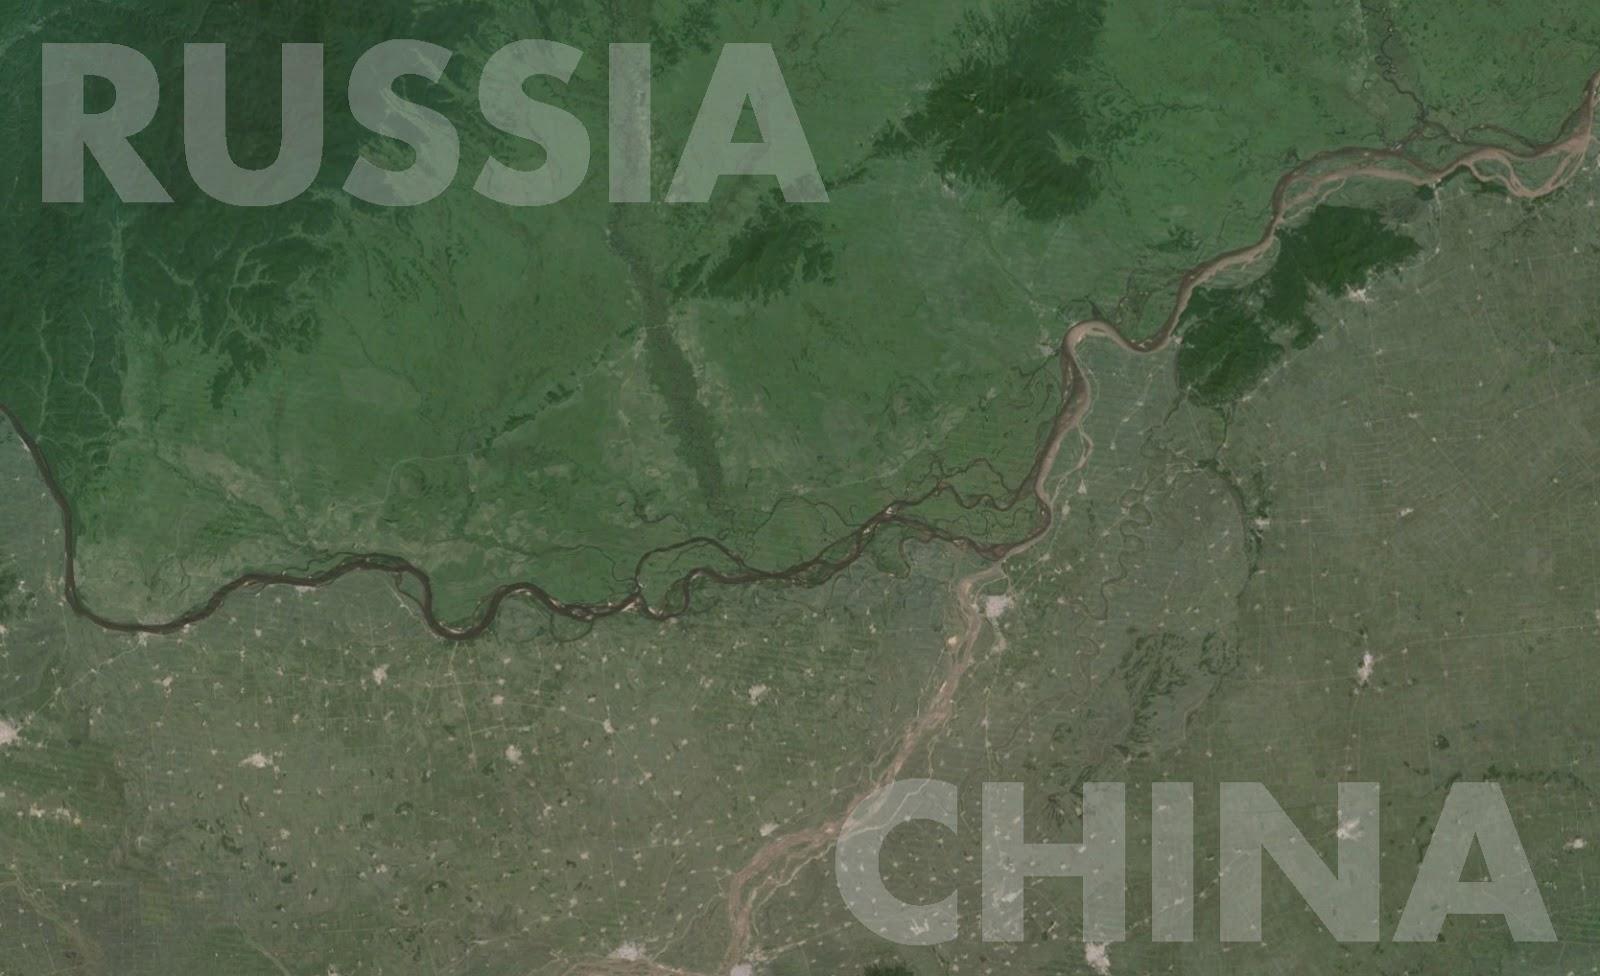 Border between Russia China